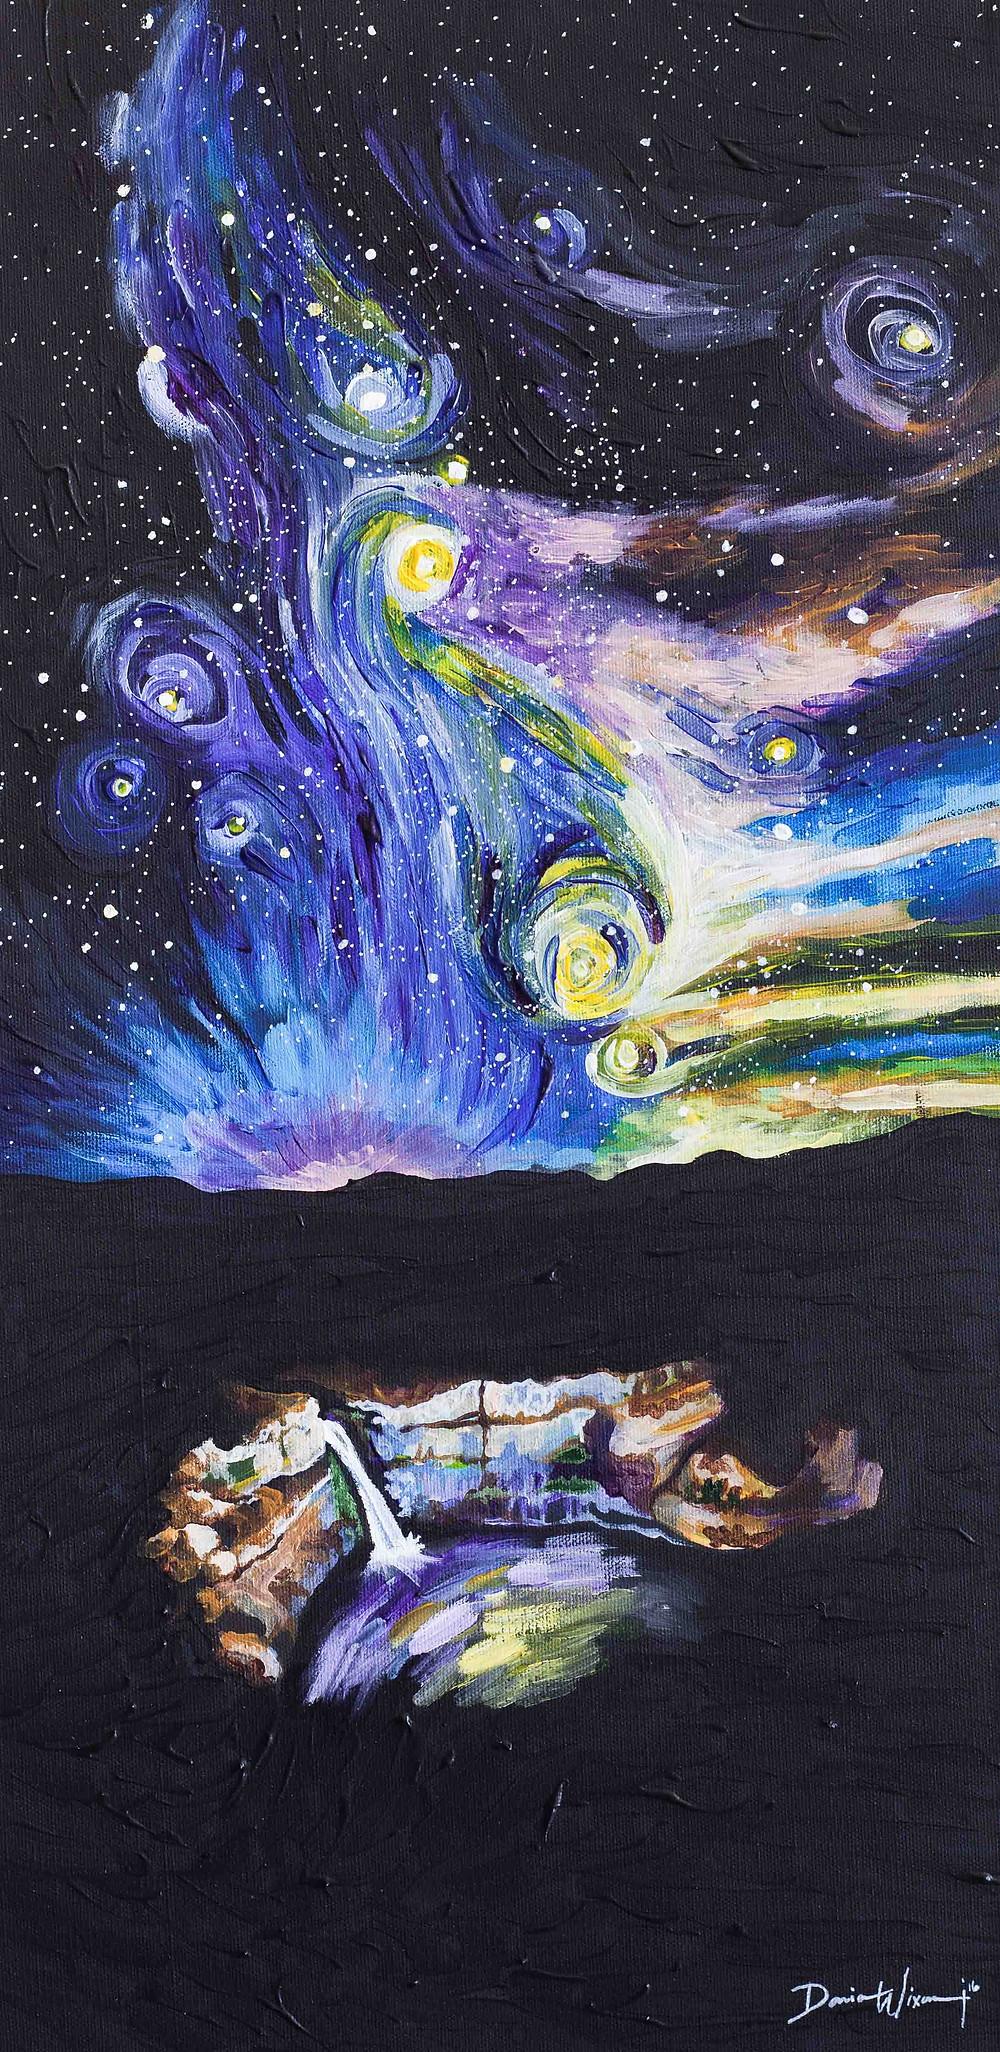 Palouse Falls, Van Gogh, Starry Night, stars, impasto, waterfall painting